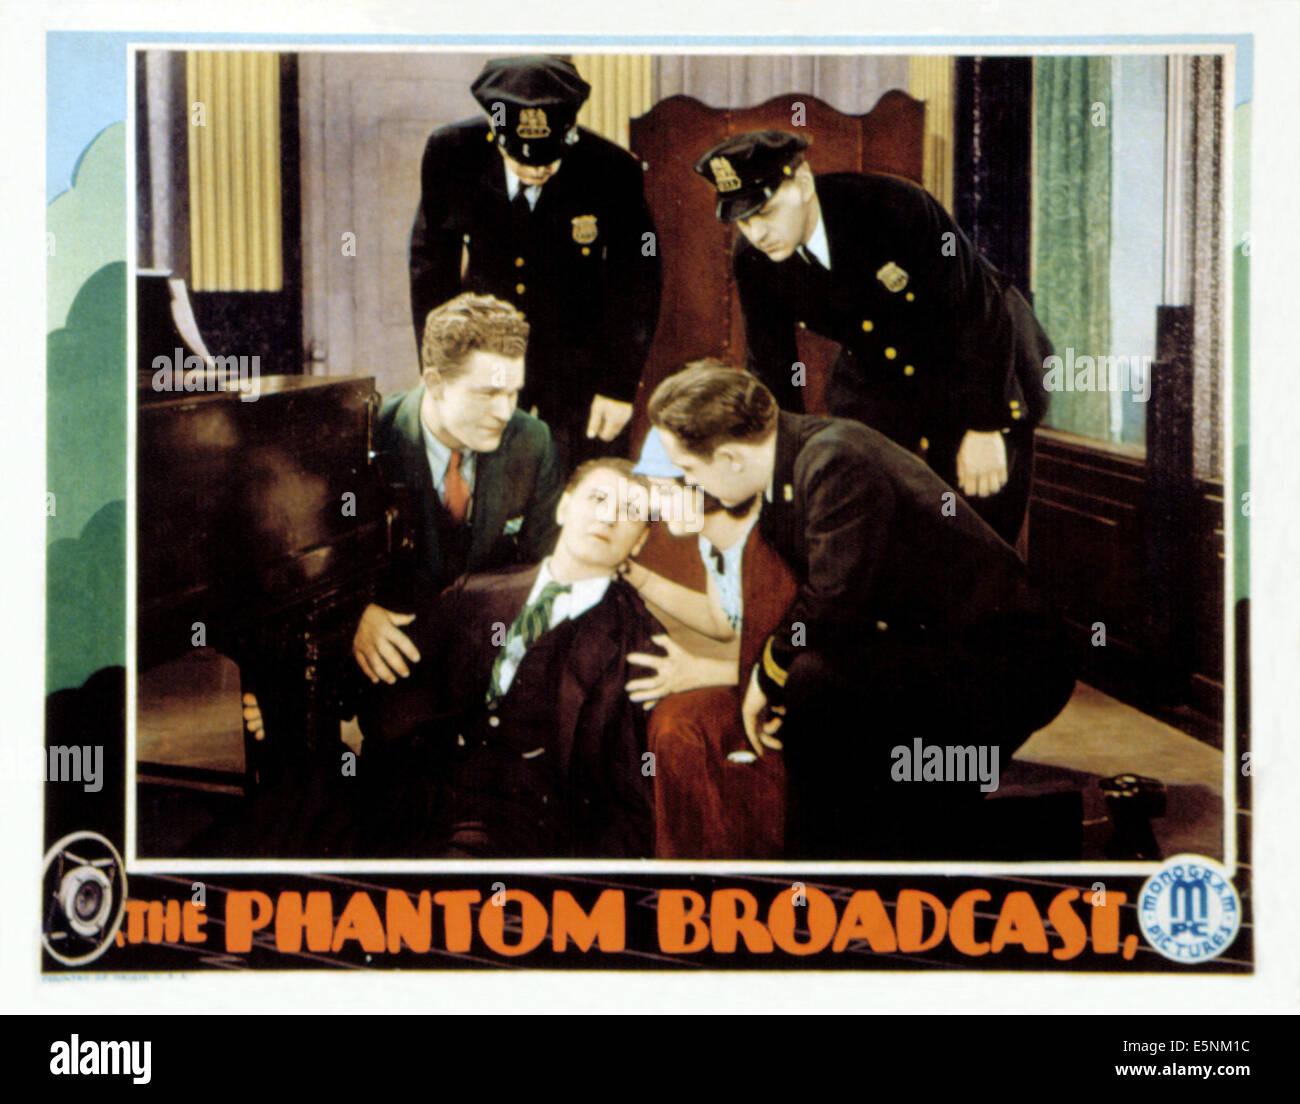 Il fantasma di broadcast, Guinn 'Big Boy' Williams, Vivienne Osborne, Ralph Forbes, 1933 Foto Stock